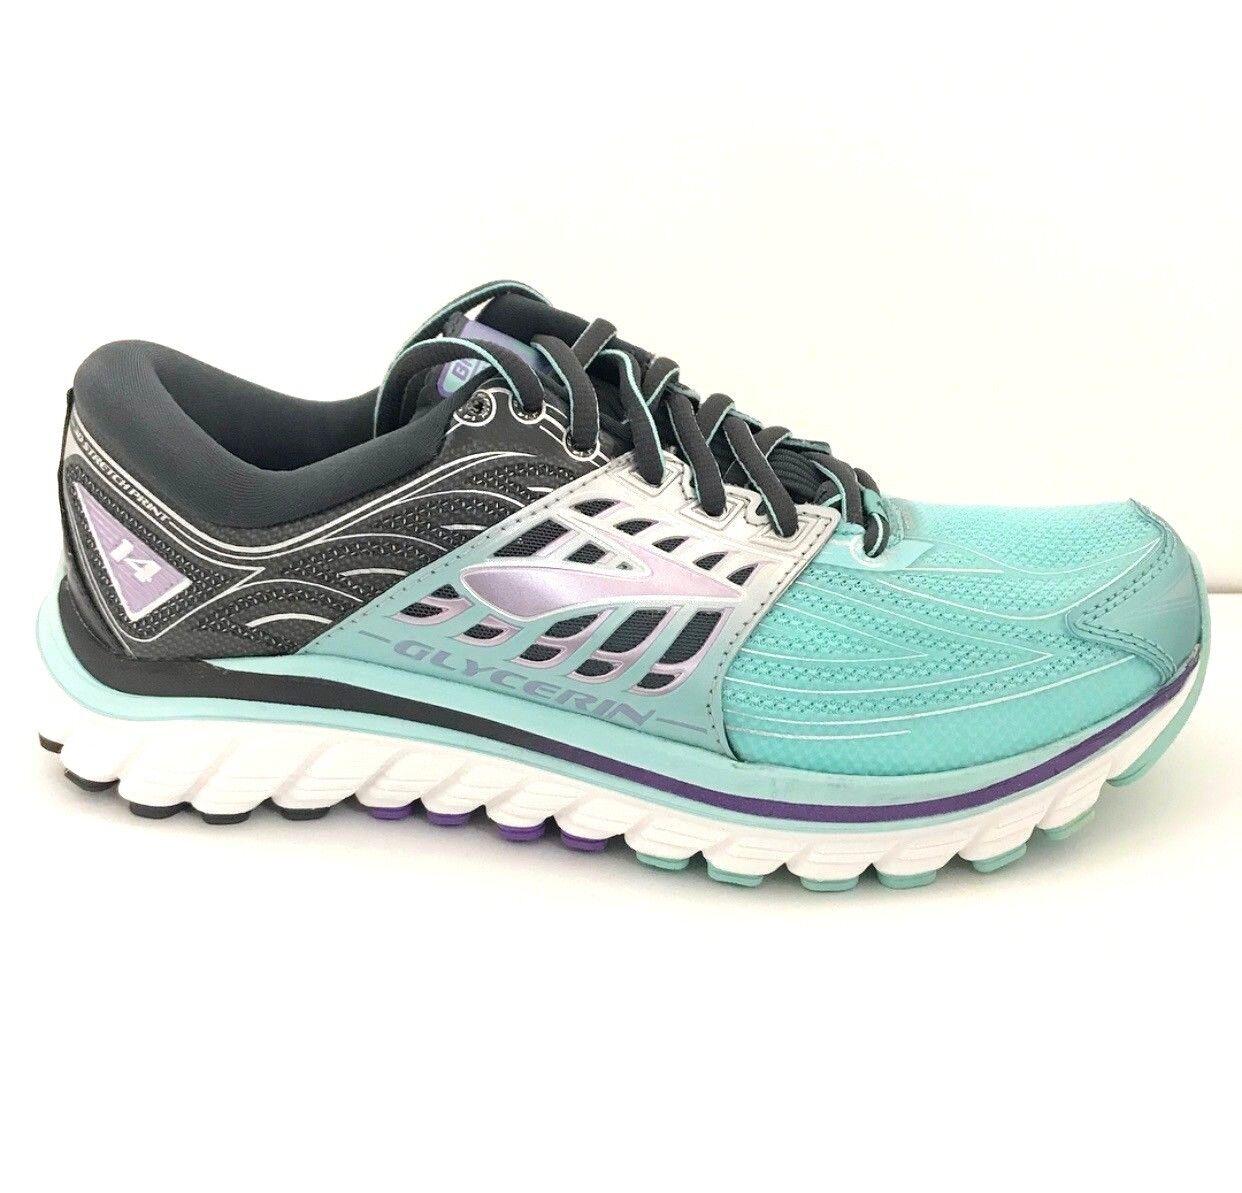 SAVE    Brooks Glycerin 14 donna  Cushioned Running scarpe (B) (444)  lo stile classico